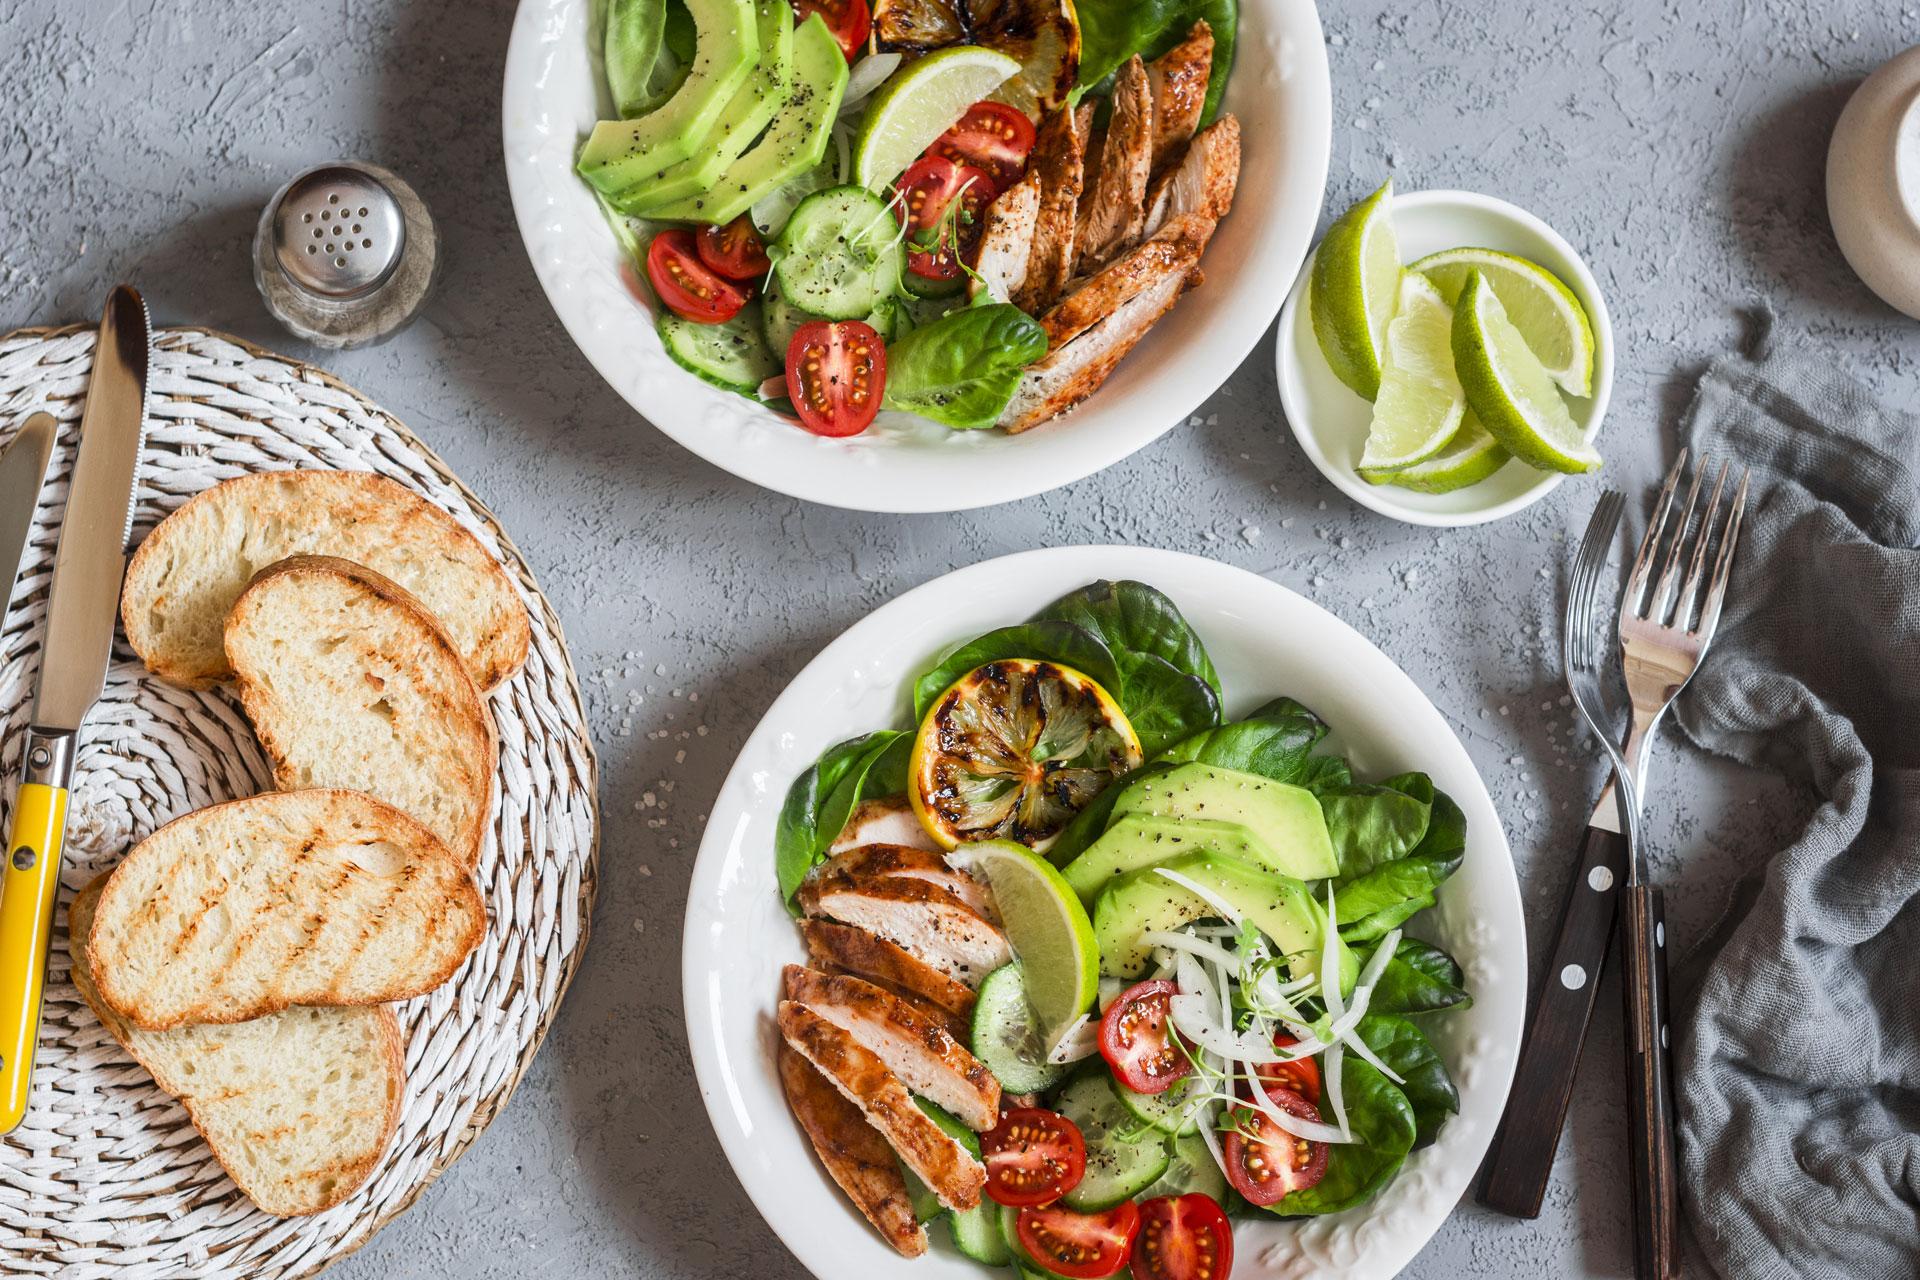 Foodee Eats: Lunch in Toronto